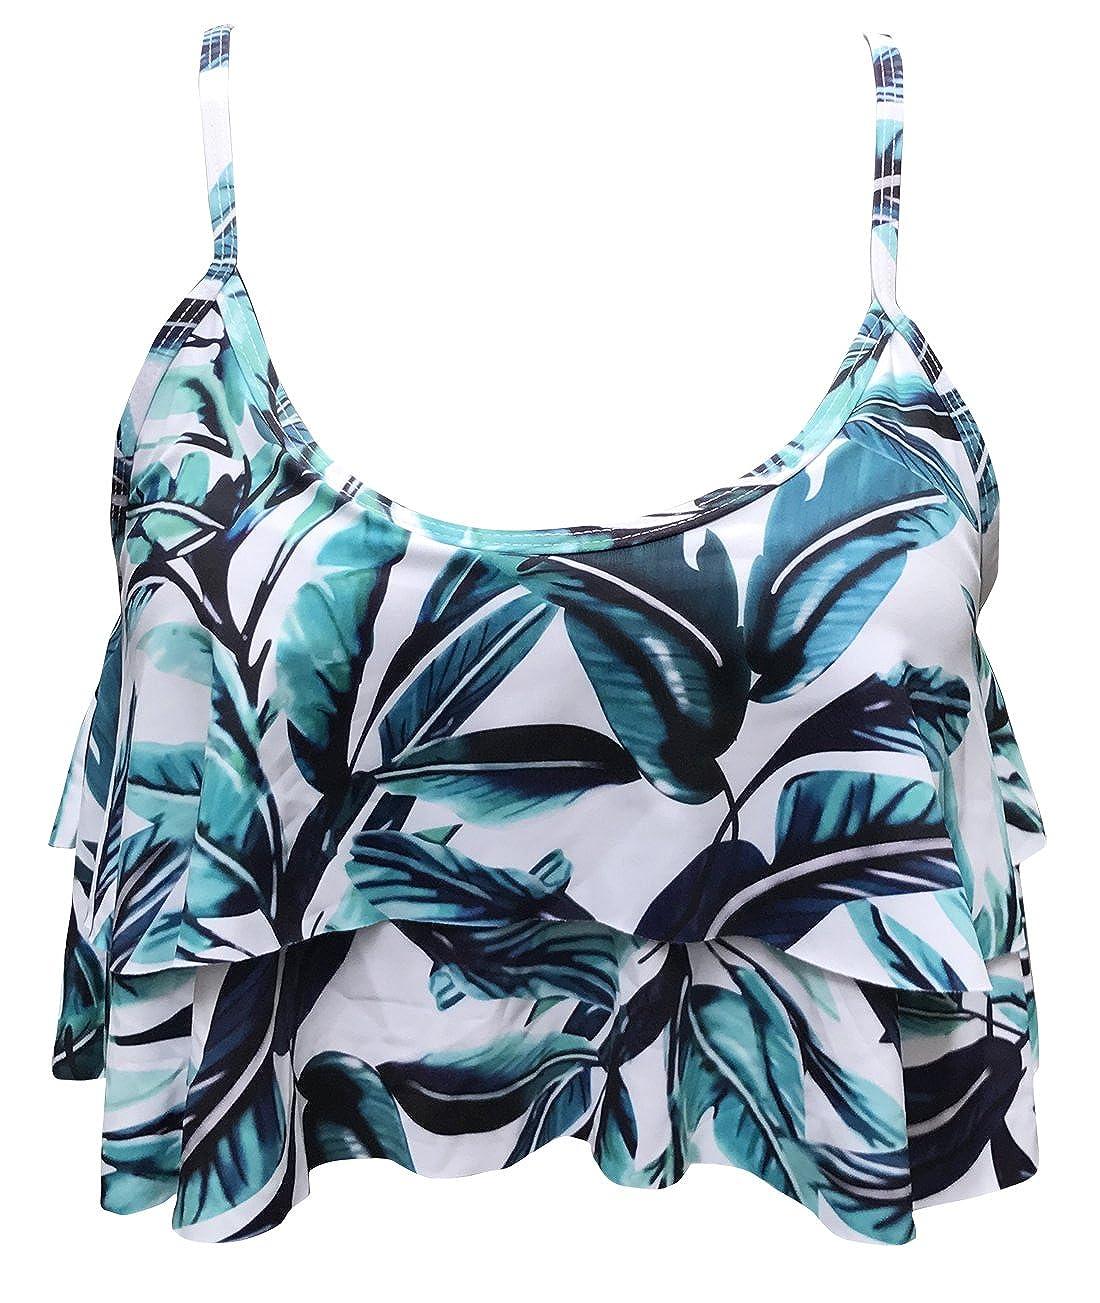 Gabrielle Aug Women's Retro Falbala Soild Floral Flounce Bikini Top Chic Swimsuit(Fba) by Gabrielle Aug